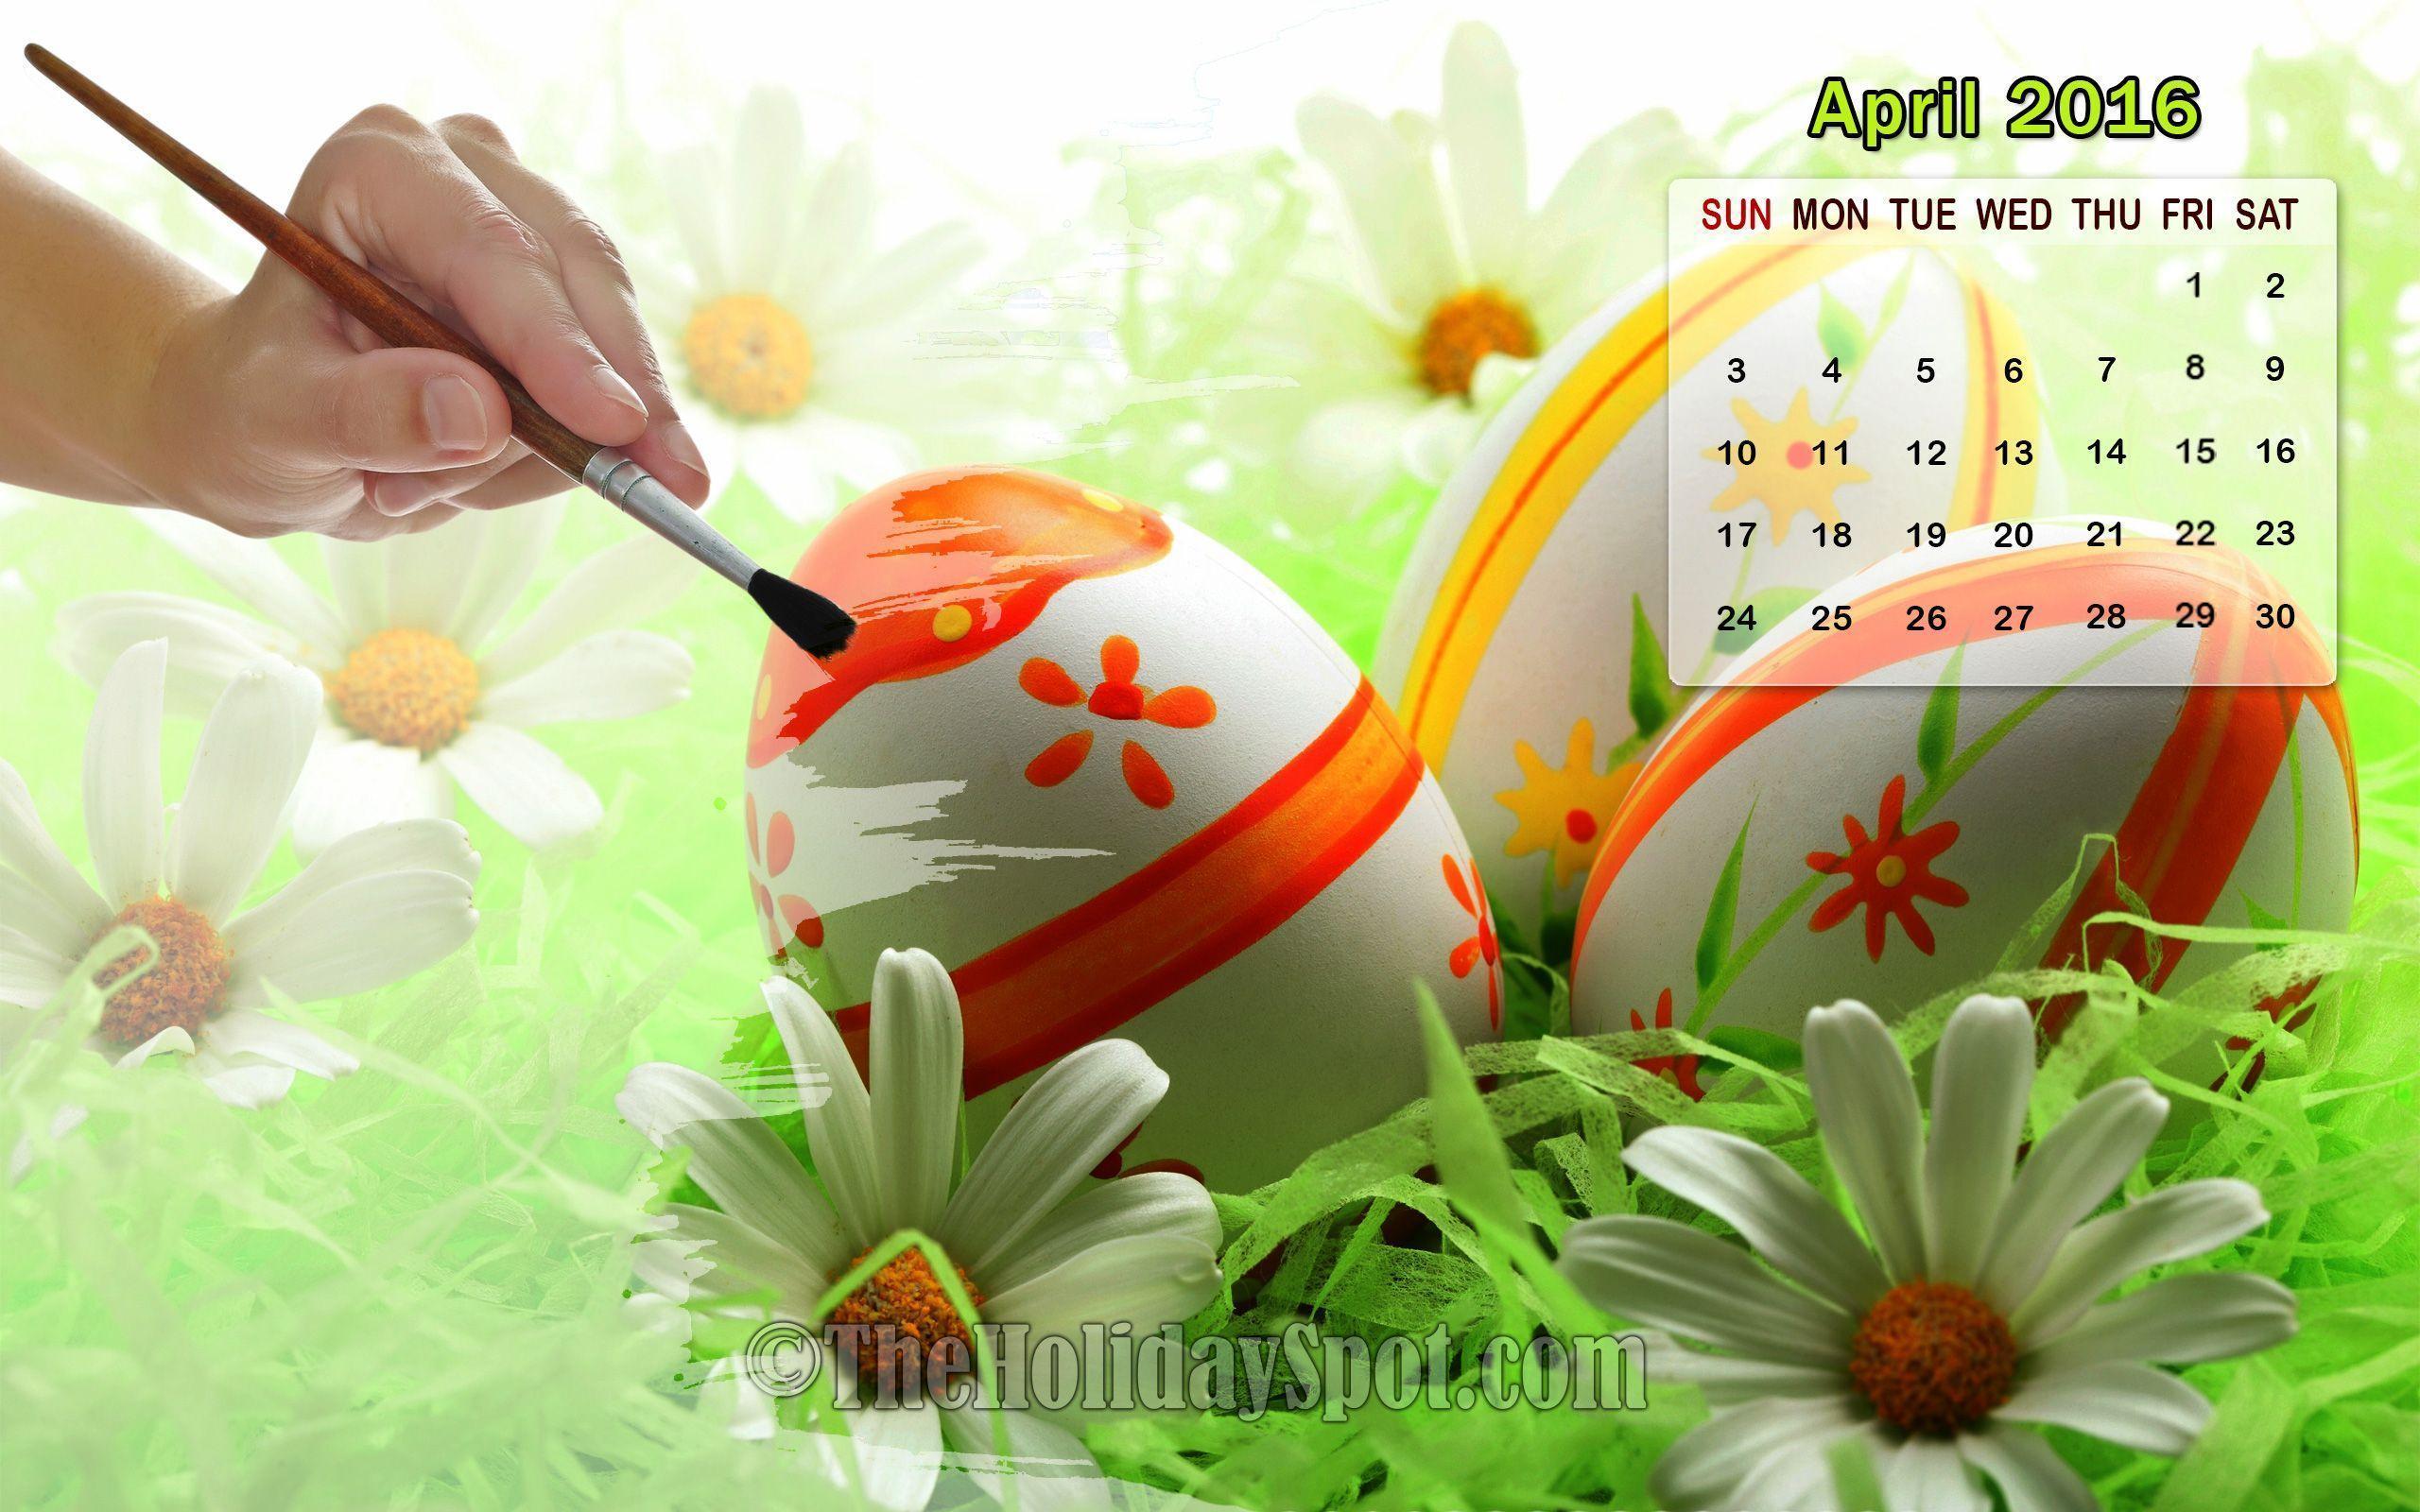 Desktop Calendar April 2016 april wallpaper images - reverse search